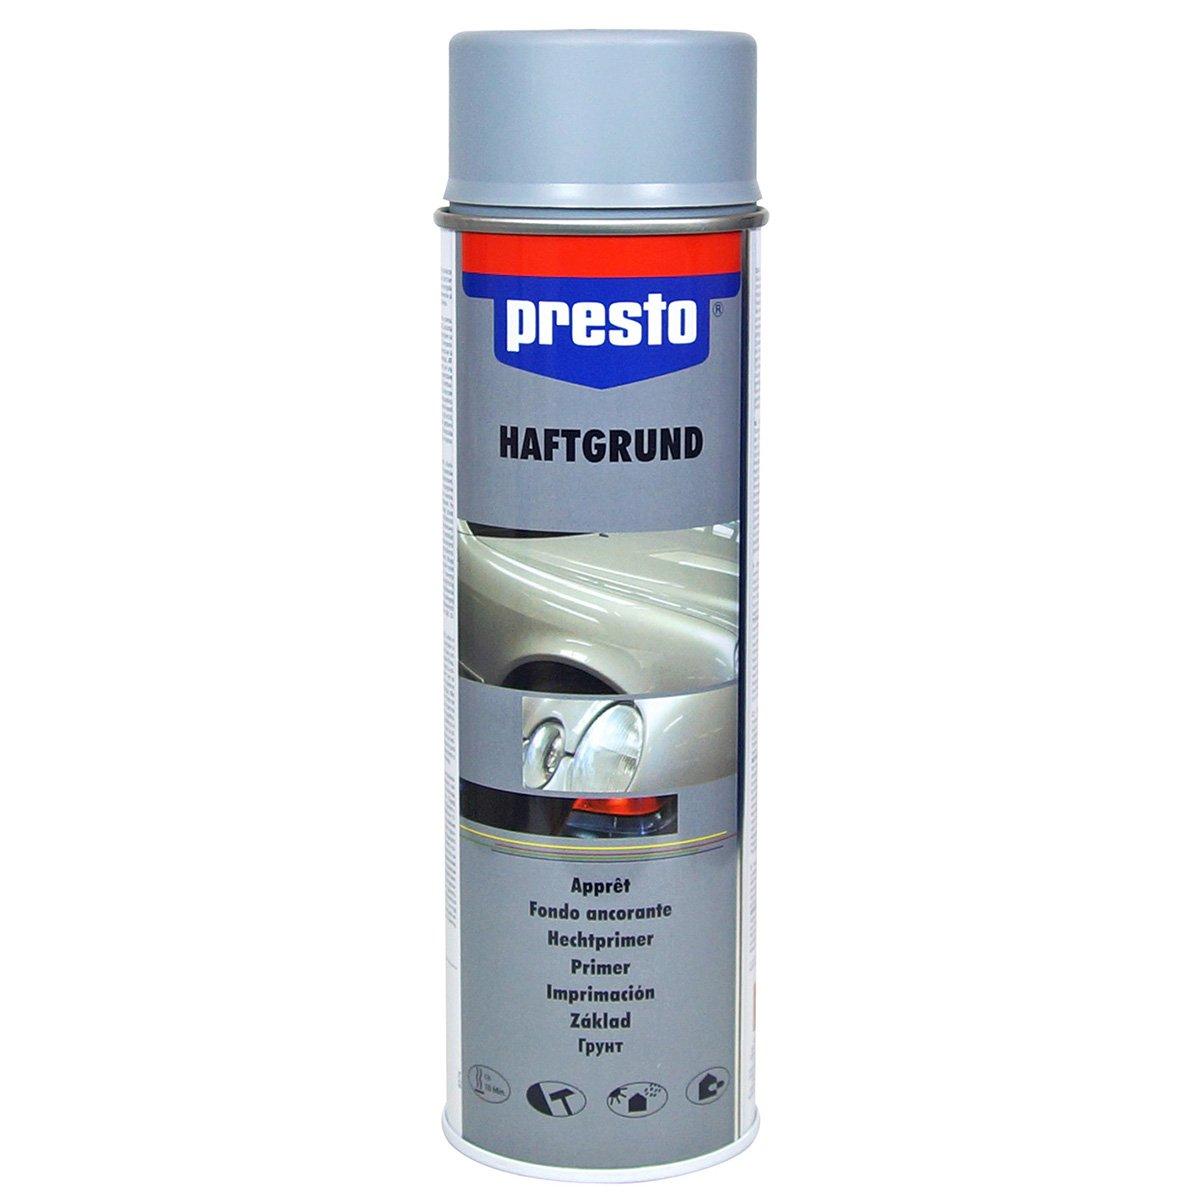 Presto 428917 Rallye-Spray, 500 ml, Haftgrund Grau MOTIP-DUPLI GmbH